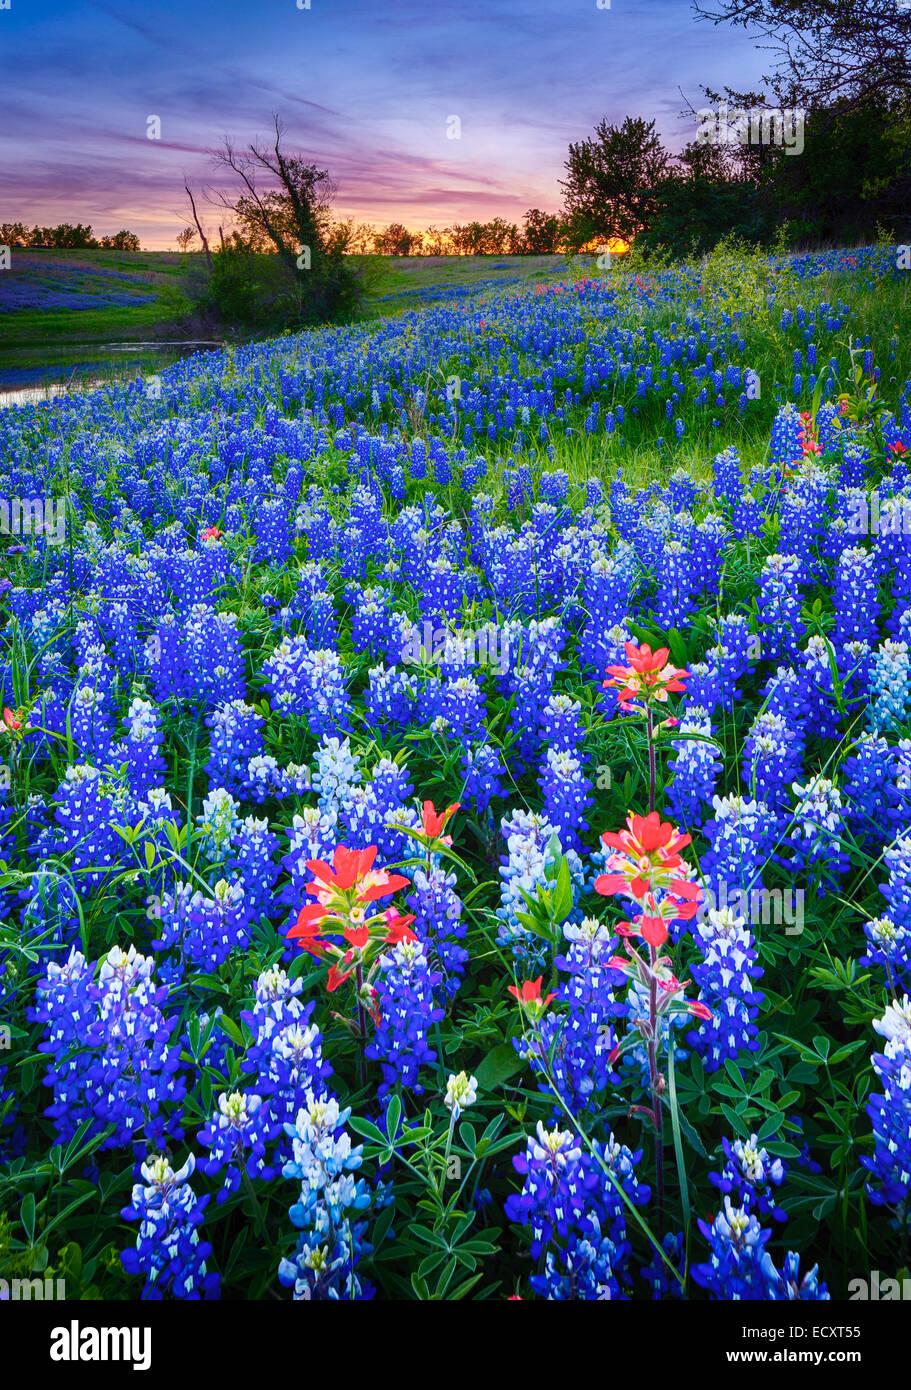 Texas pennello e bluebonnets a Ennis, Texas. Lupinus texensis, Texas bluebonnet, è una specie endemica di lupino Immagini Stock